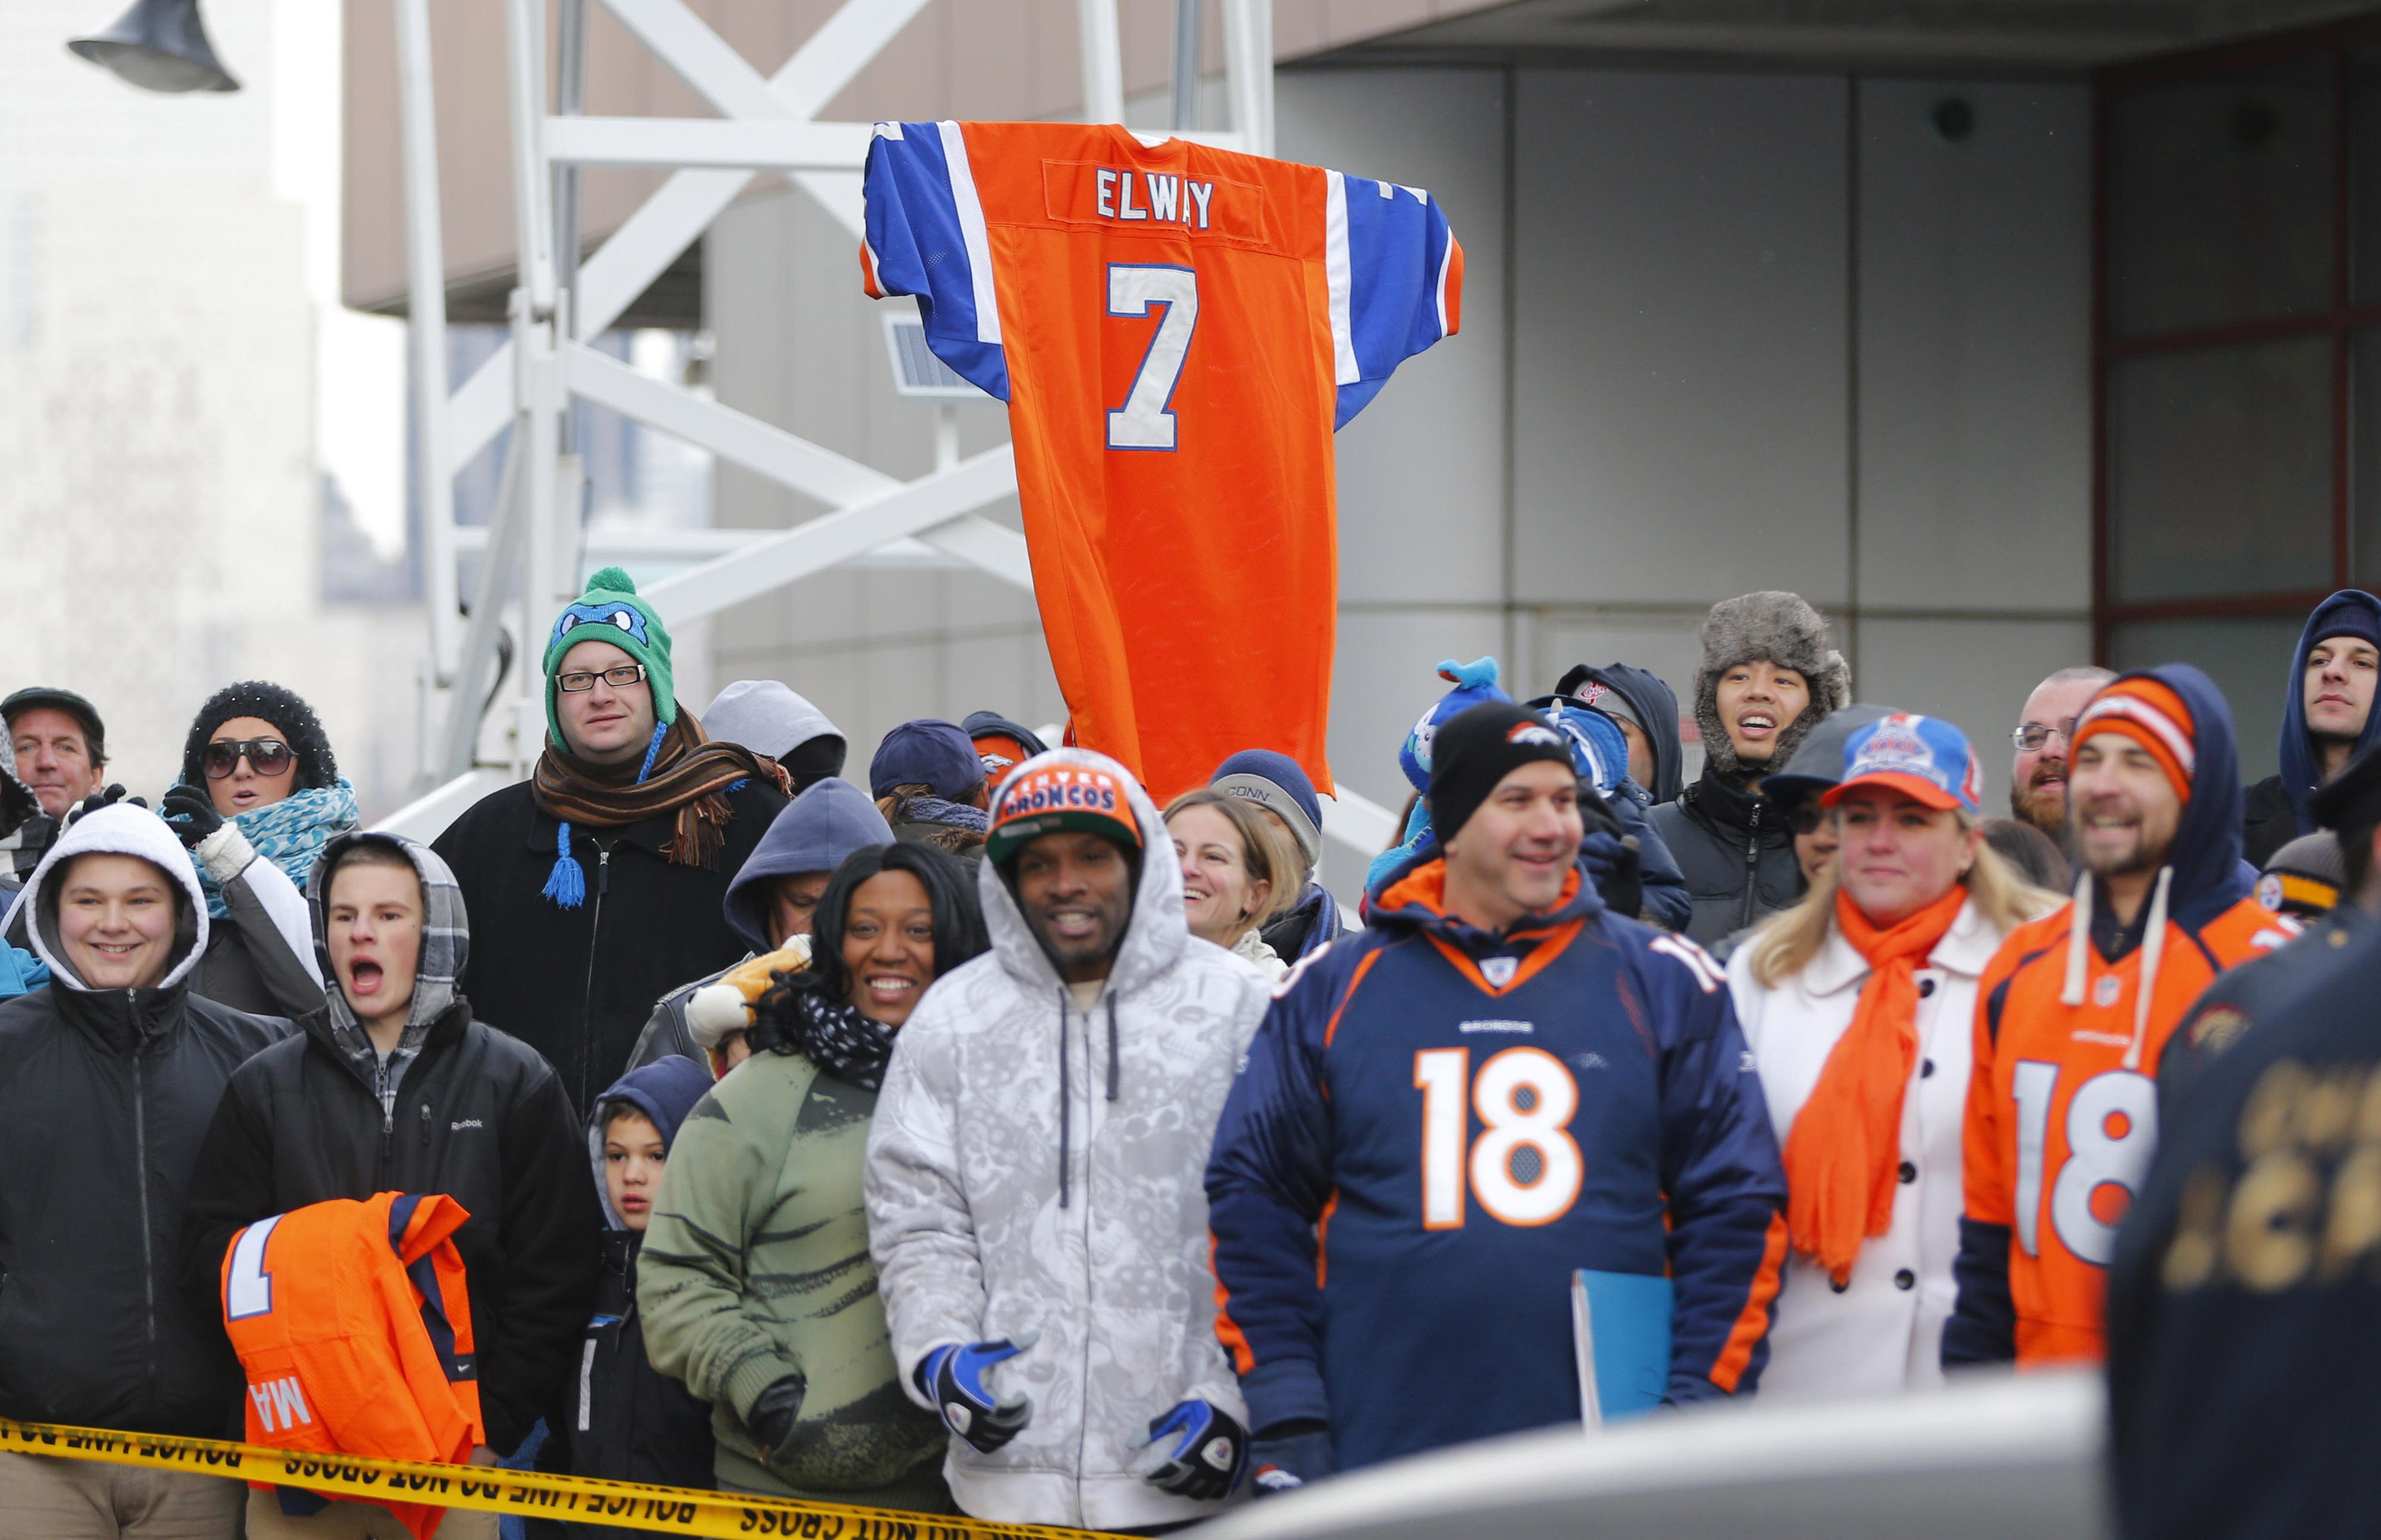 Broncos' fans await the arrival of their team on Sunday